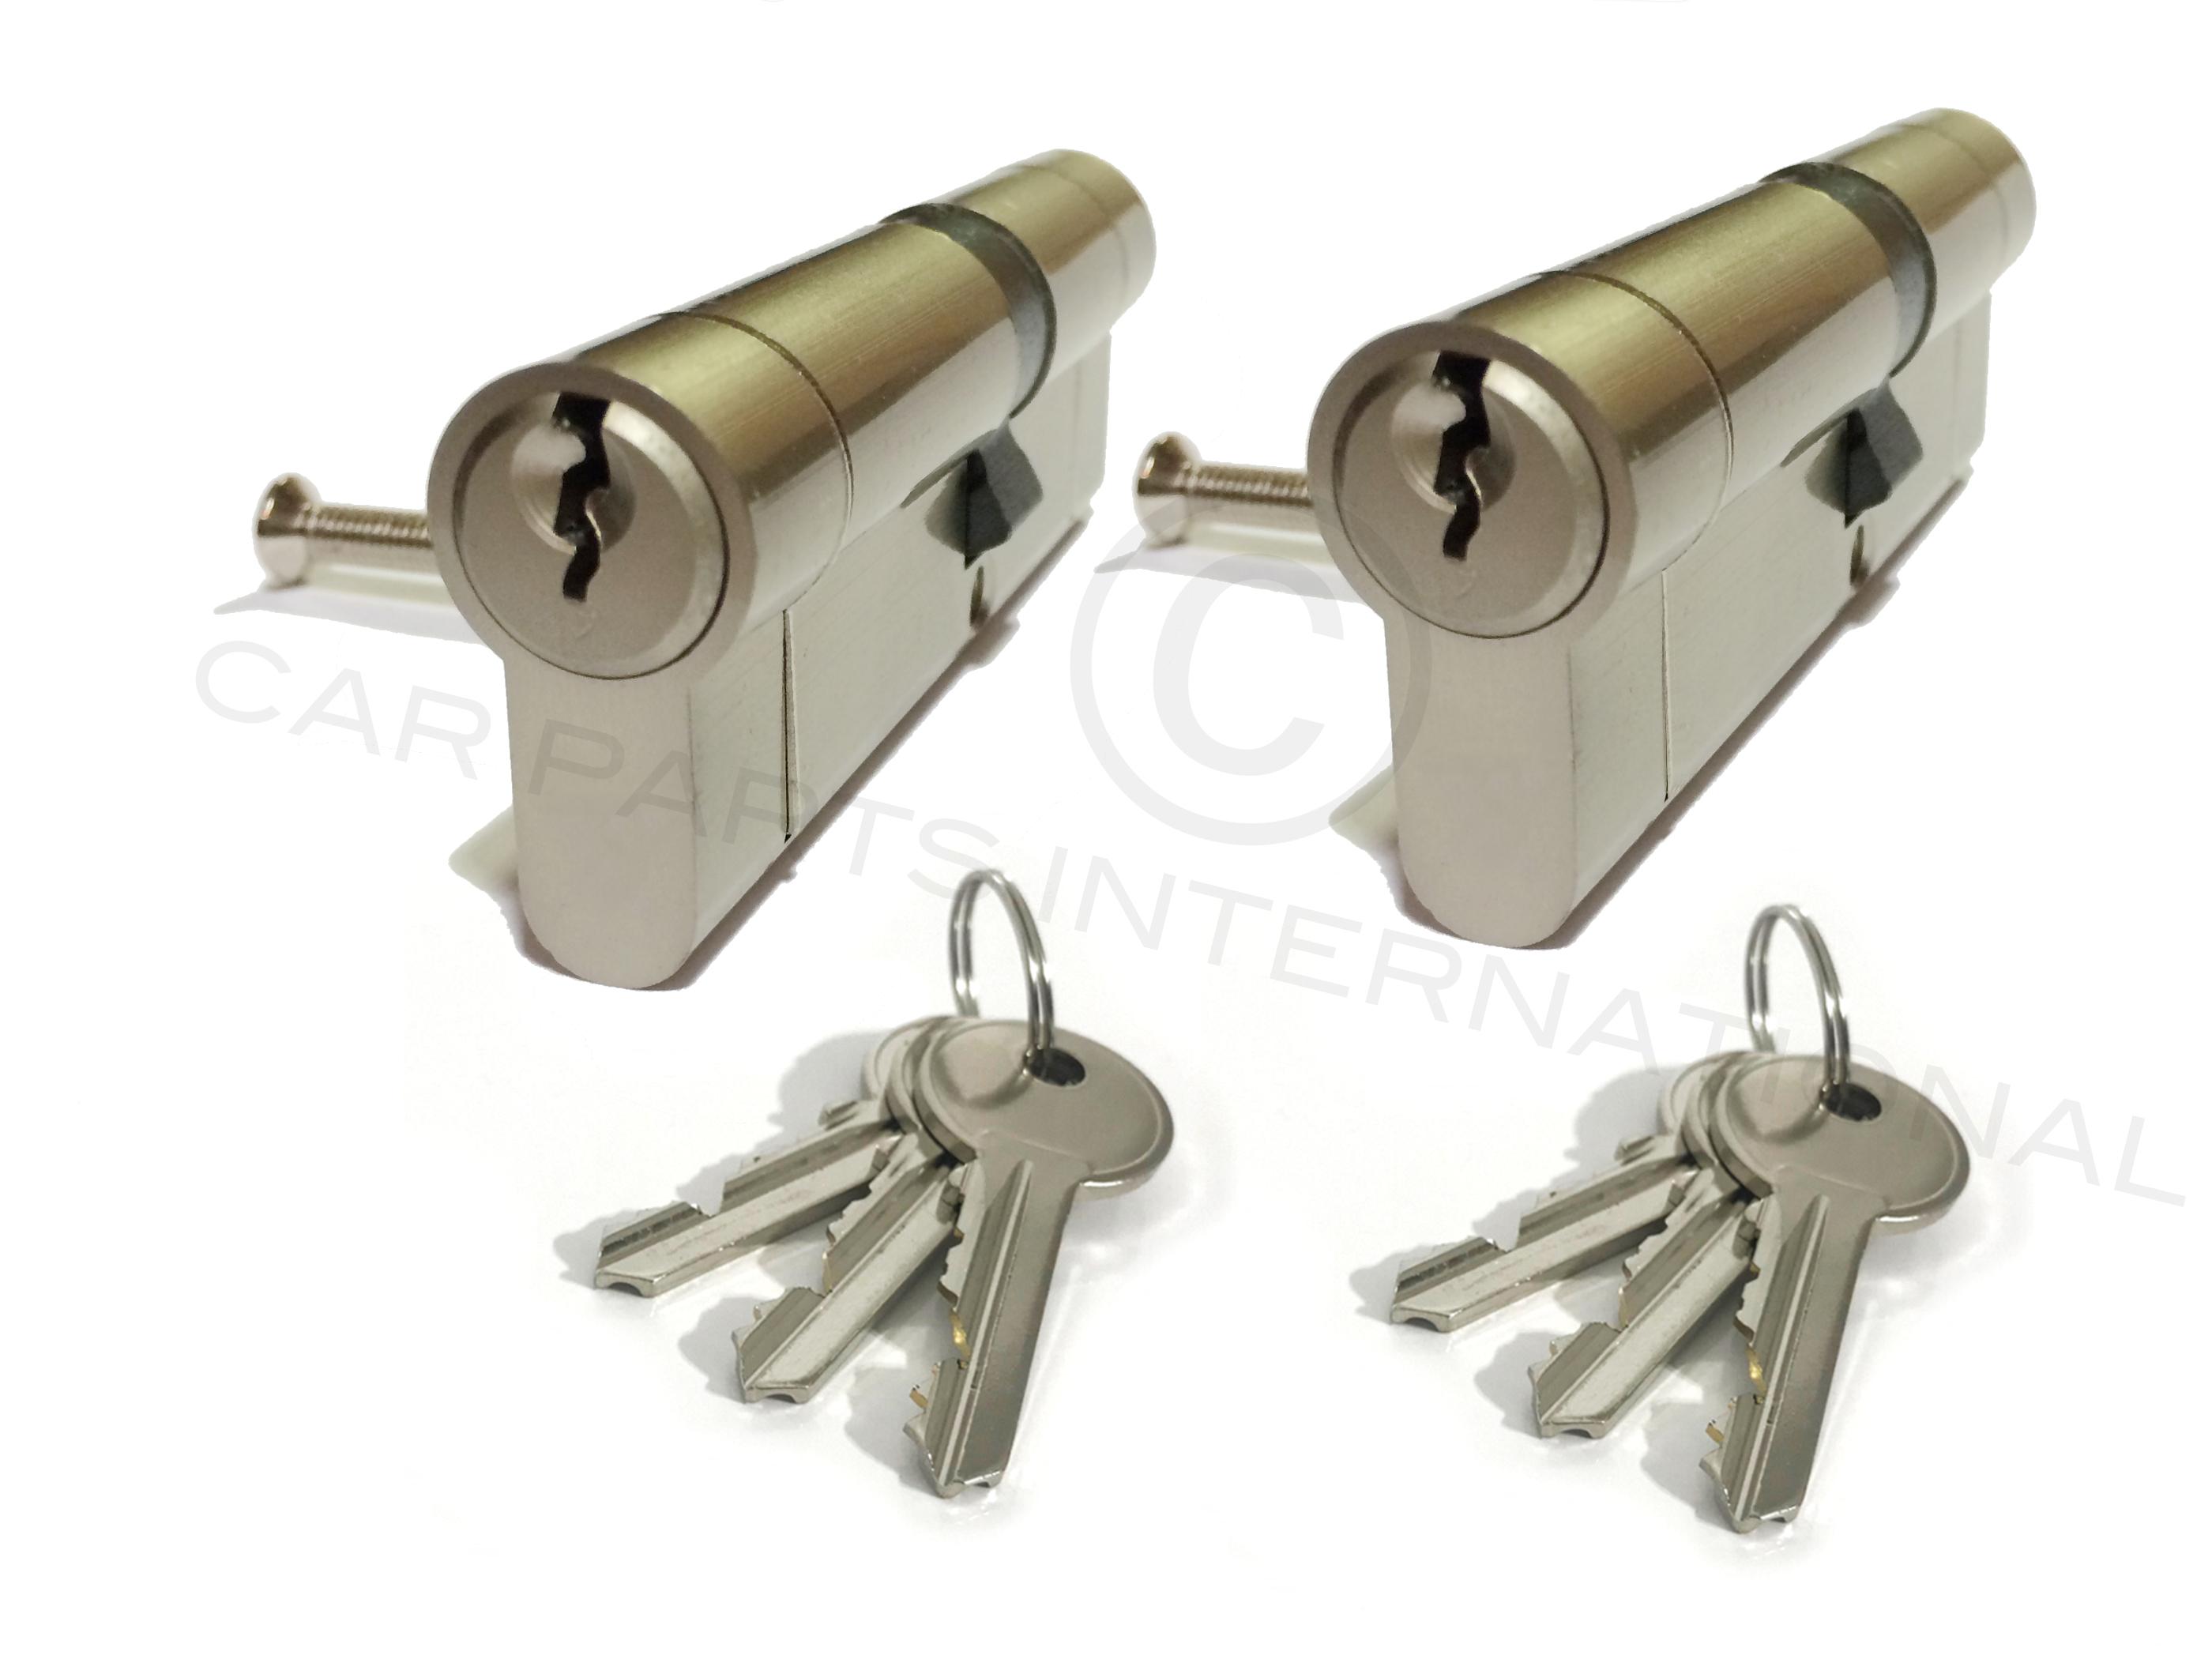 2 x Secure Euro Door Locks 40//60 NICKEL Finish Keyed Alike 3 Keys Per Lock